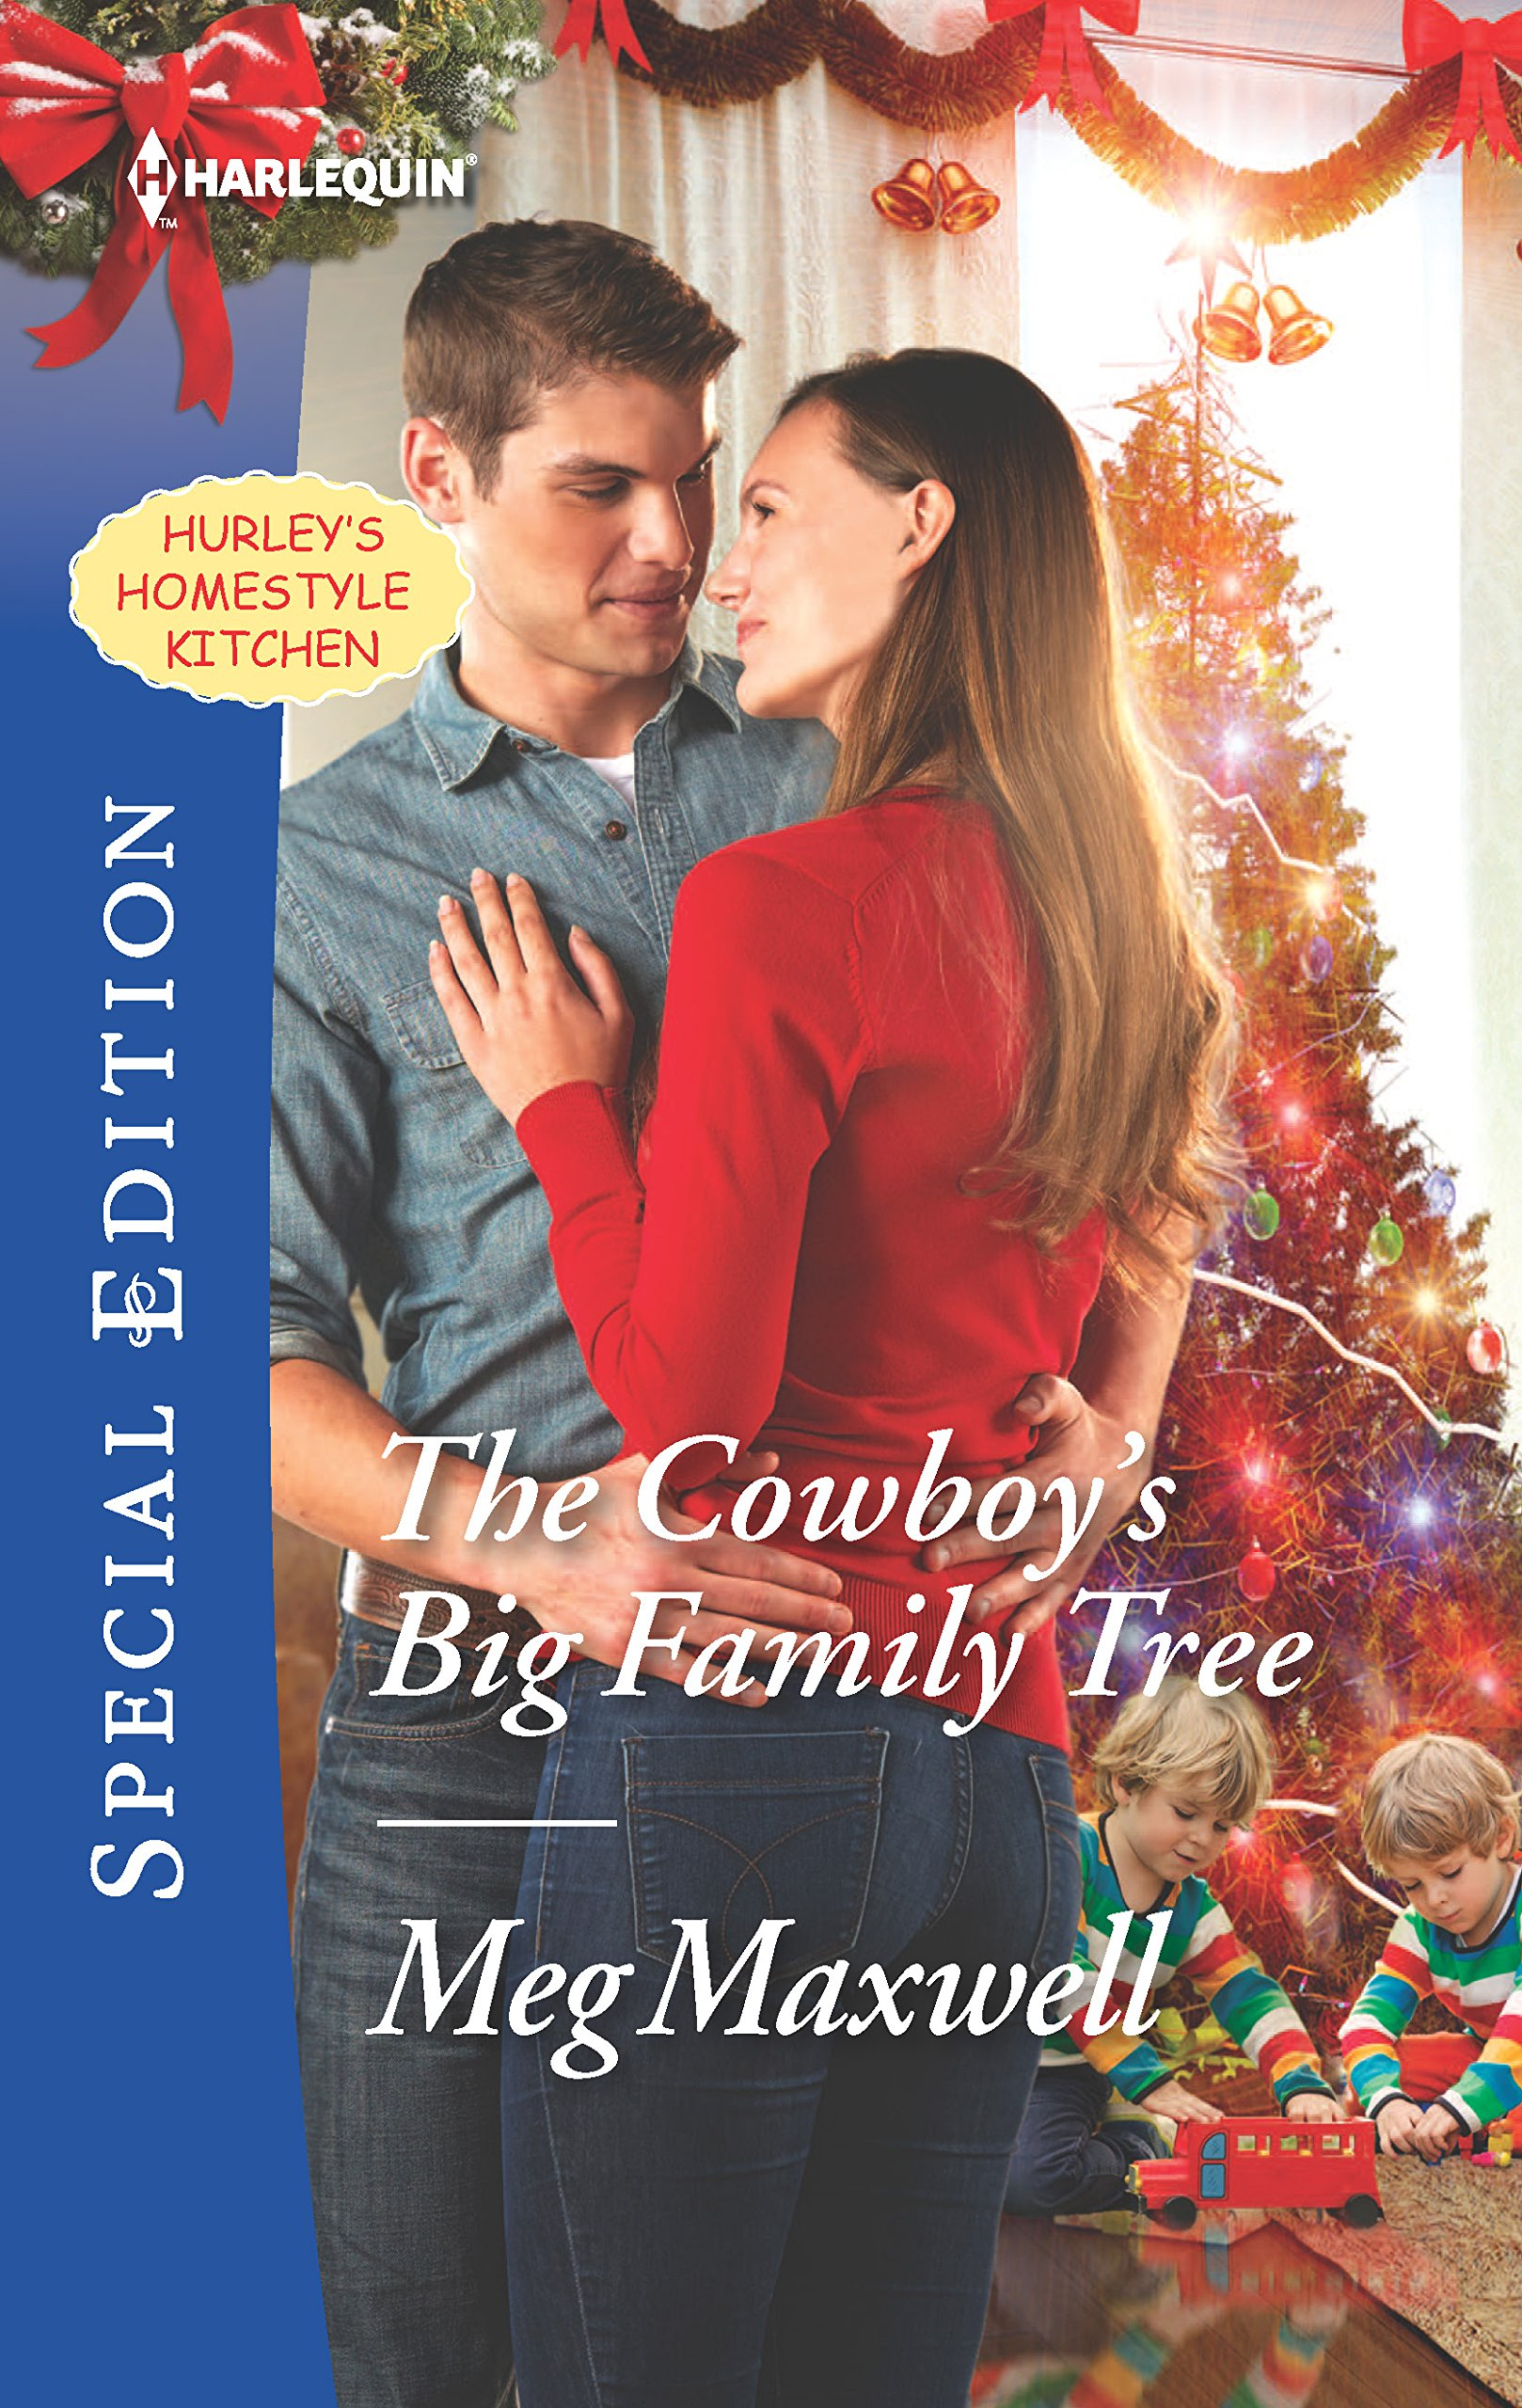 American Homestyle Kitchen The Cowboys Big Family Tree Hurleys Homestyle Kitchen Meg